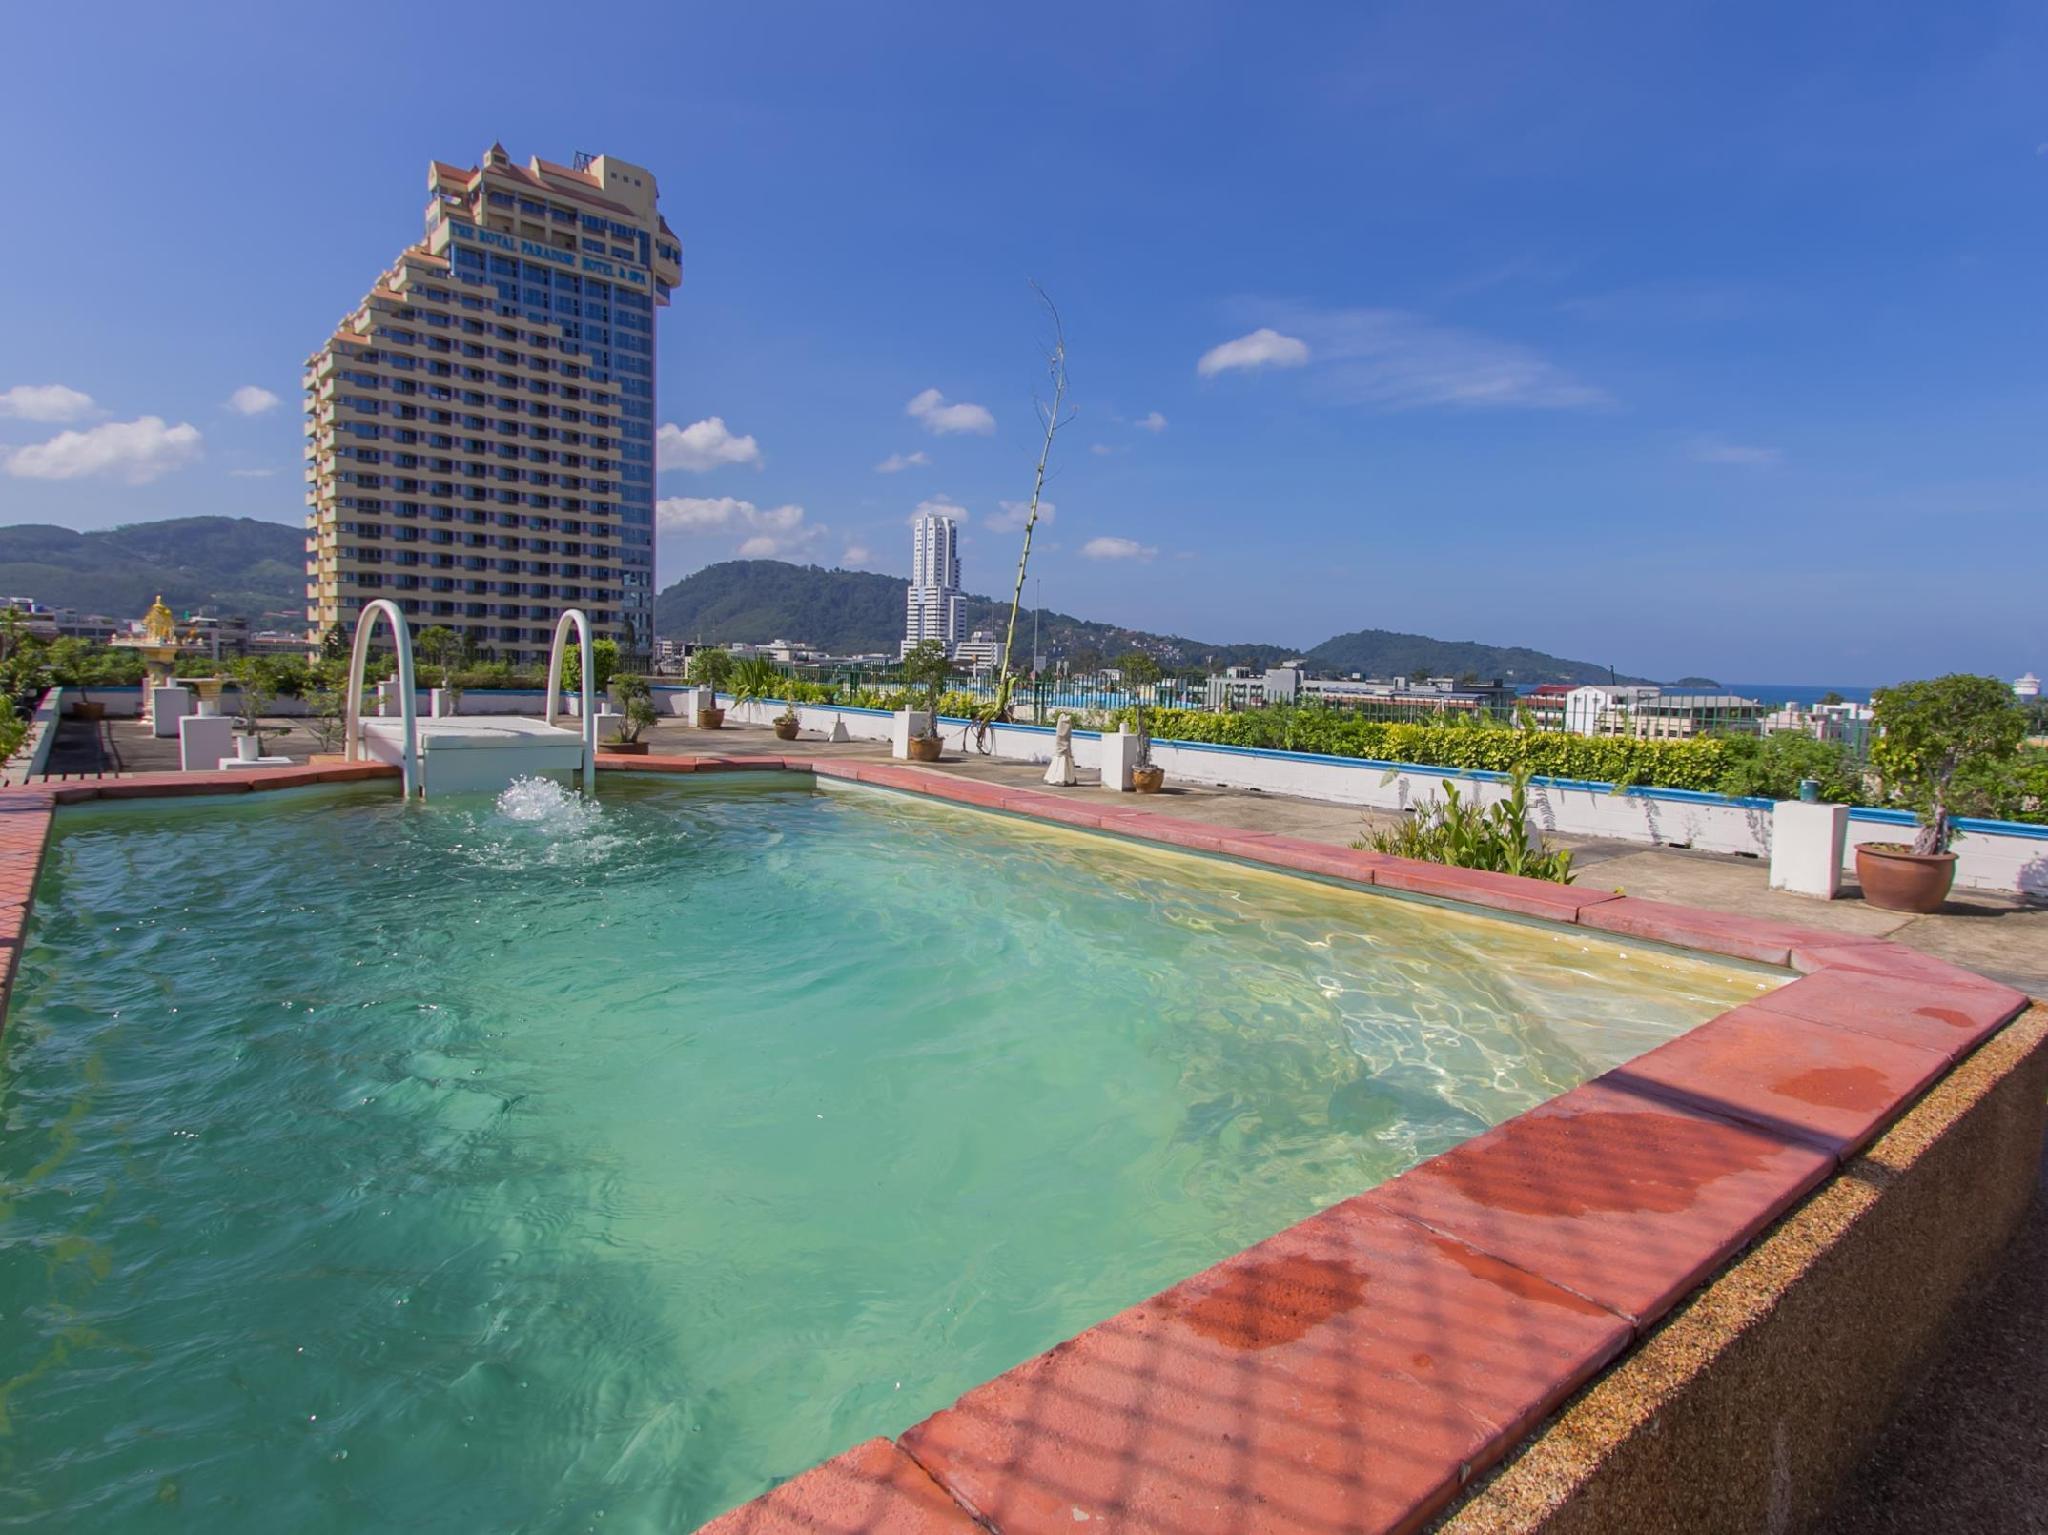 Bel Aire Patong, Phuket By The ASHLEE เบลแอร์ ป่าตอง ภูเก็ต บาย ดิ แอชลี